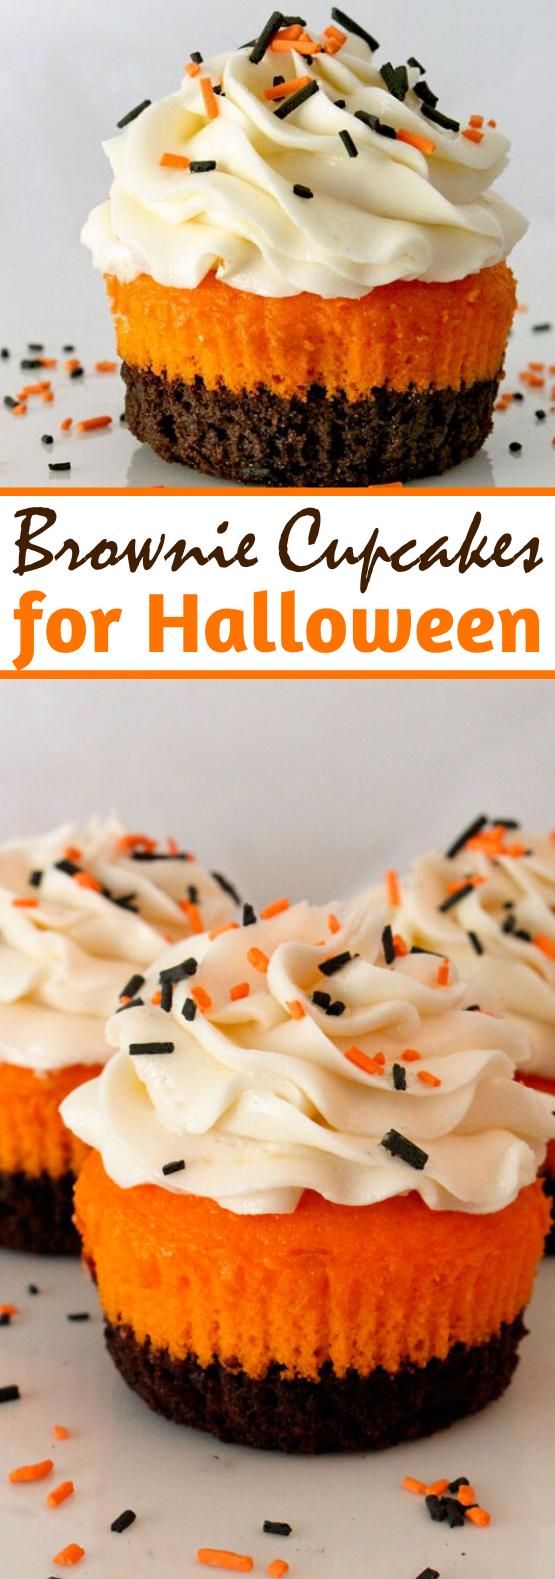 Brownie Cupcakes #cake #recipes #desserts #baking #halloween